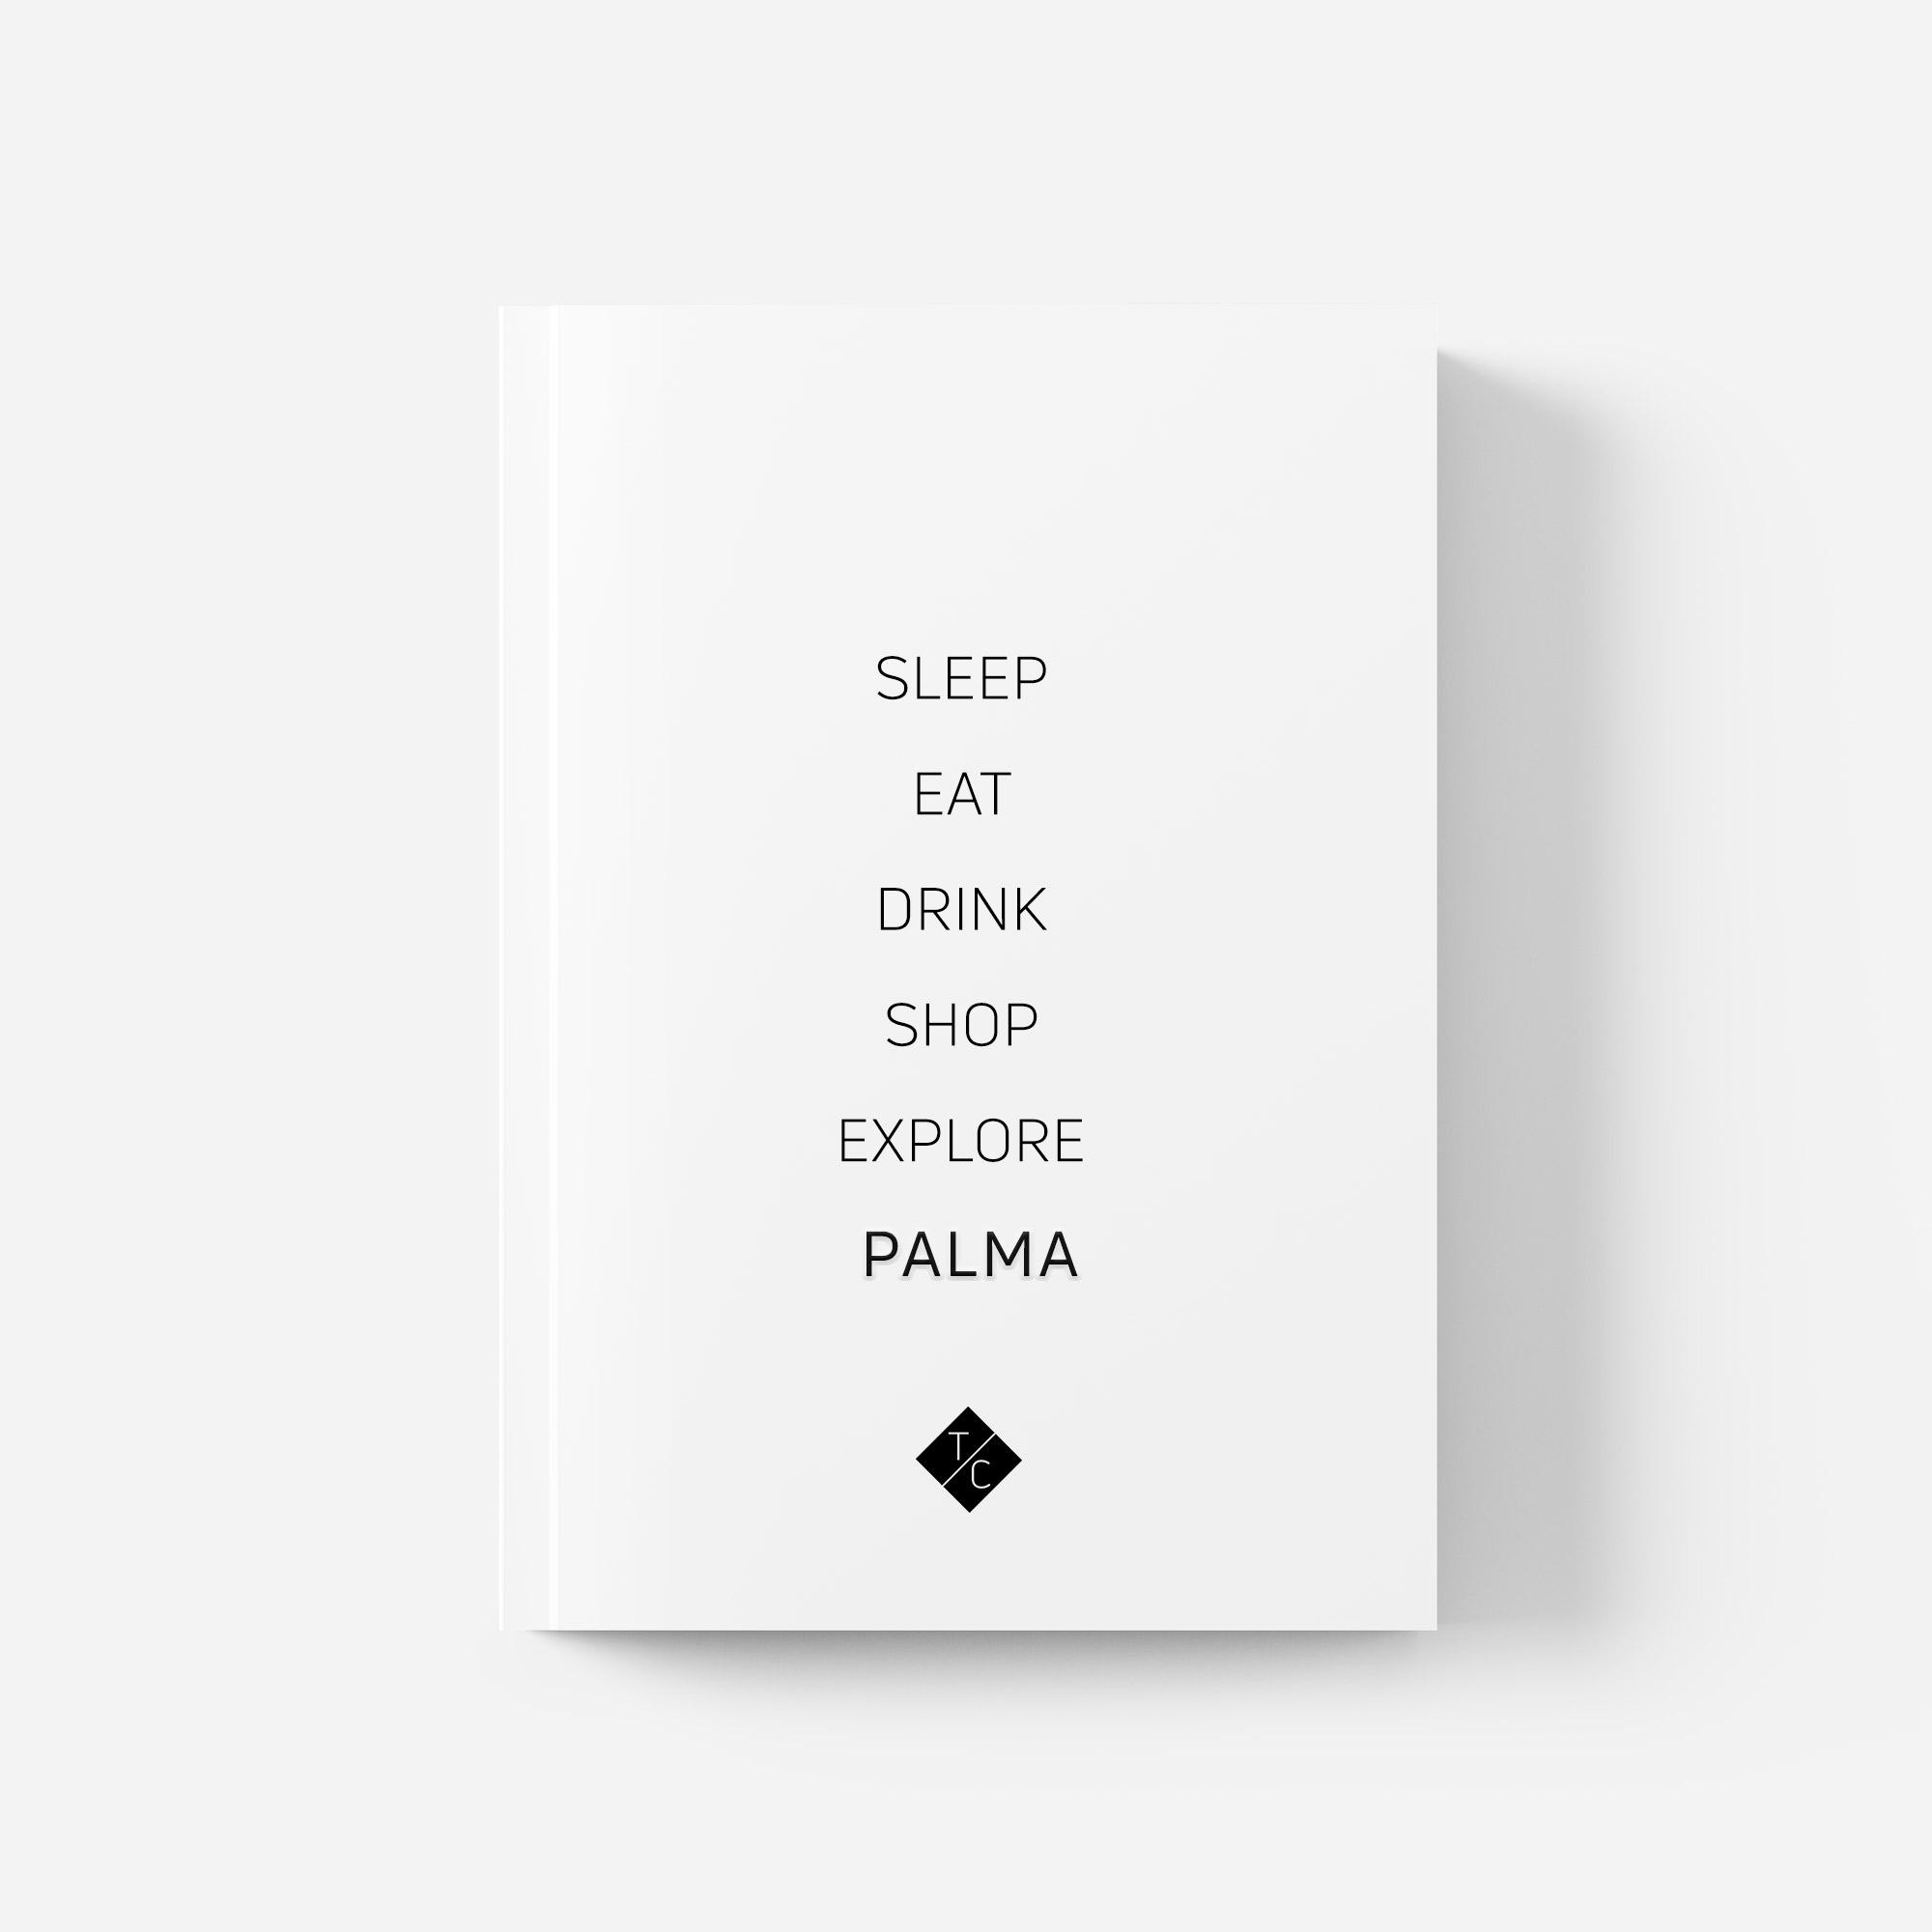 Cover_mit_praegung_palma